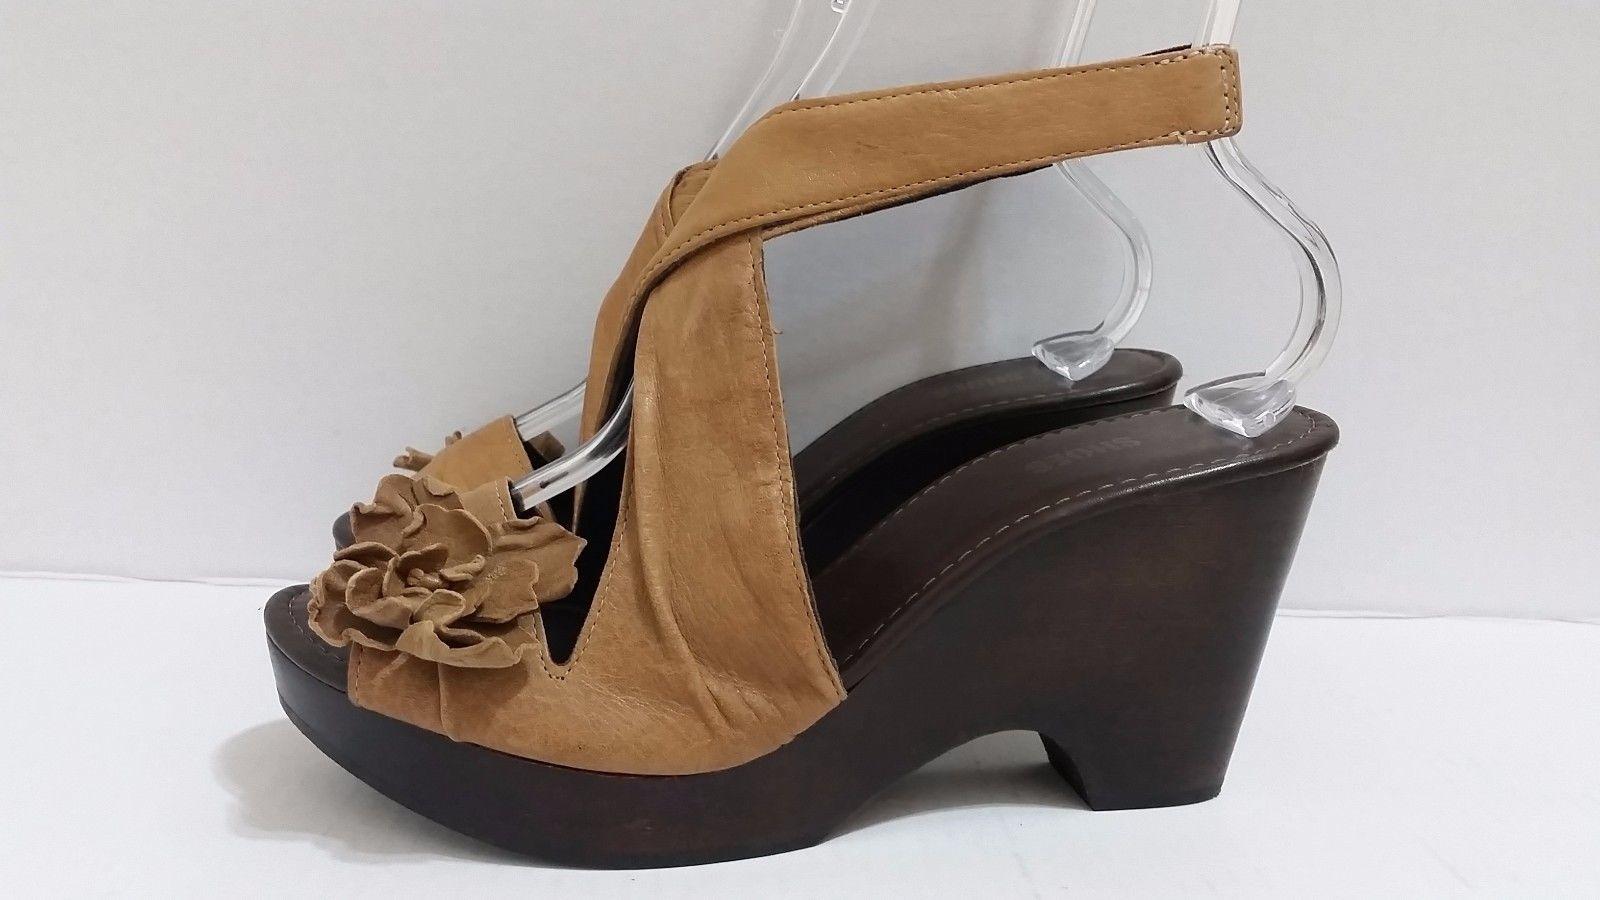 e0b03fddc3f NARA SHOES Brown Leather Sandals Wooden Platform Heels Peep Toe Sling Back  Wrap